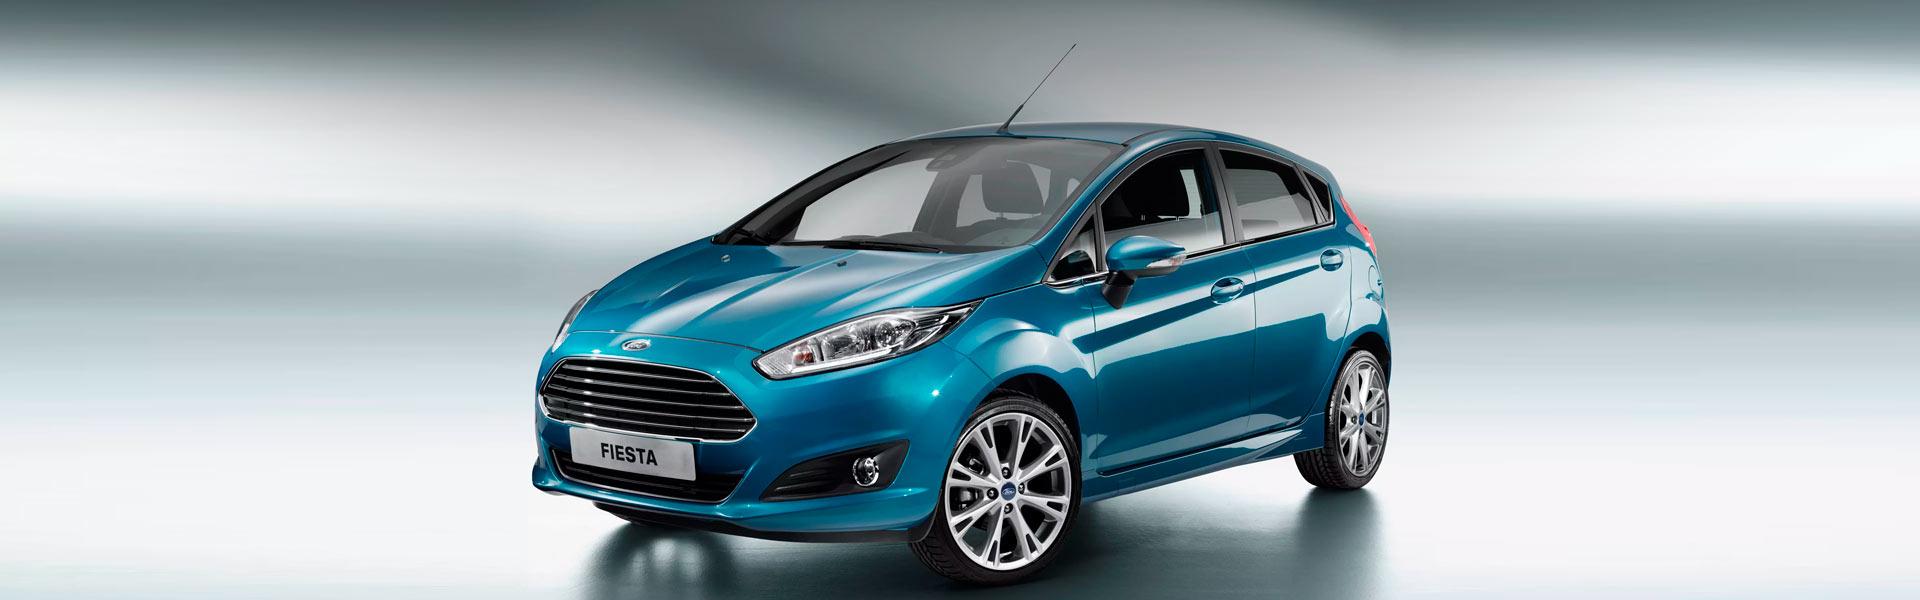 Запчасти на Ford Fiesta